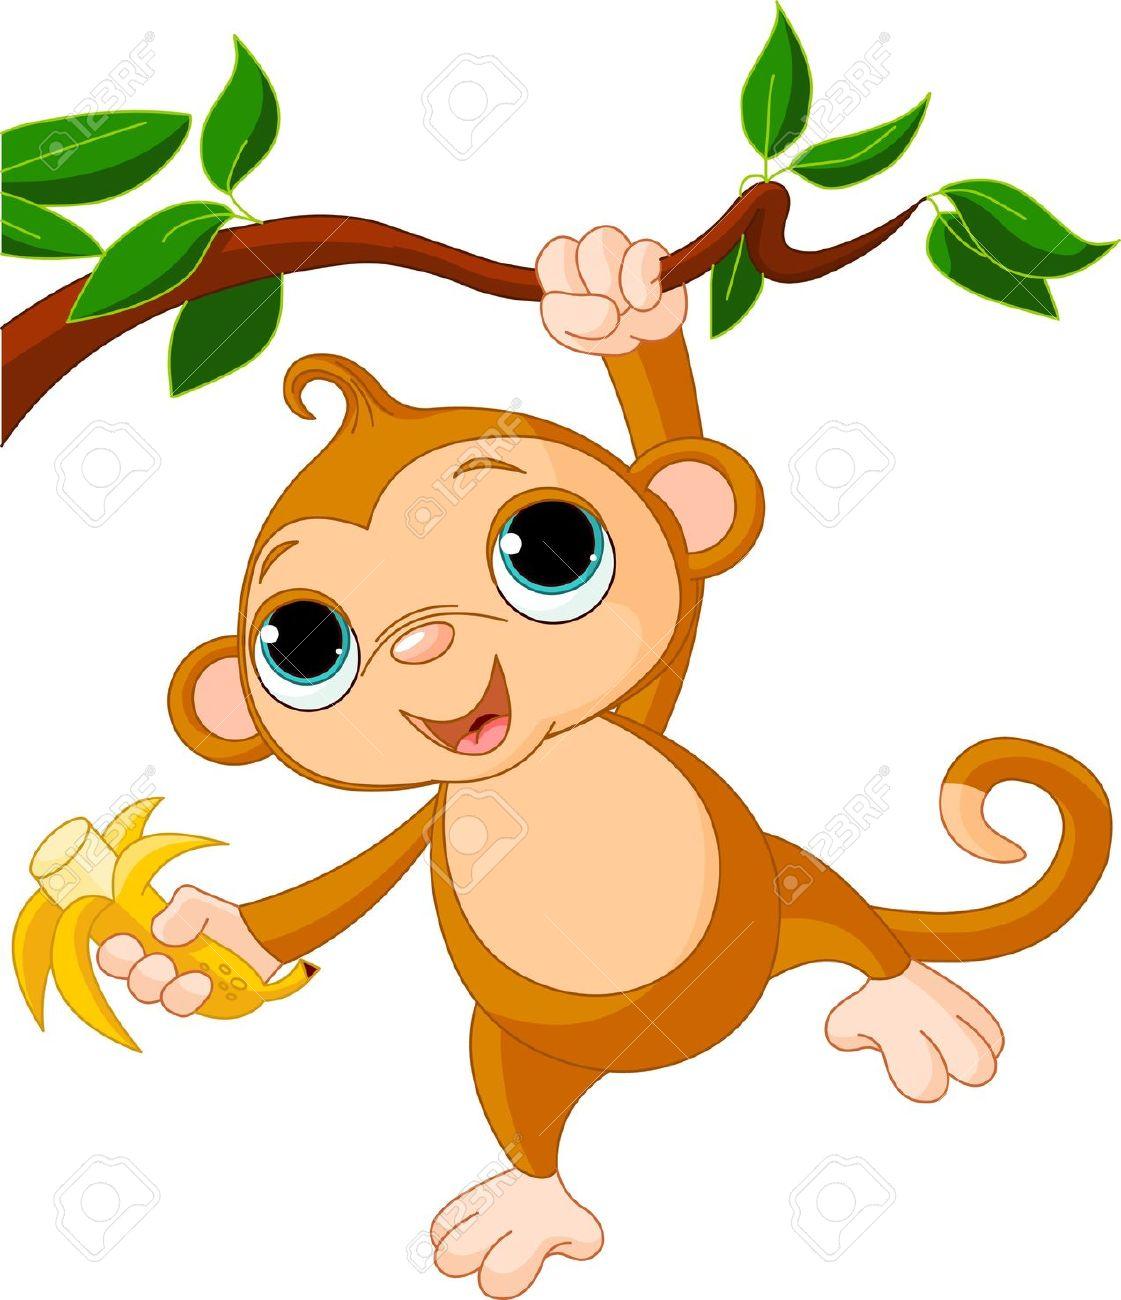 Gambar Monyet Lucu Gokil Kocak